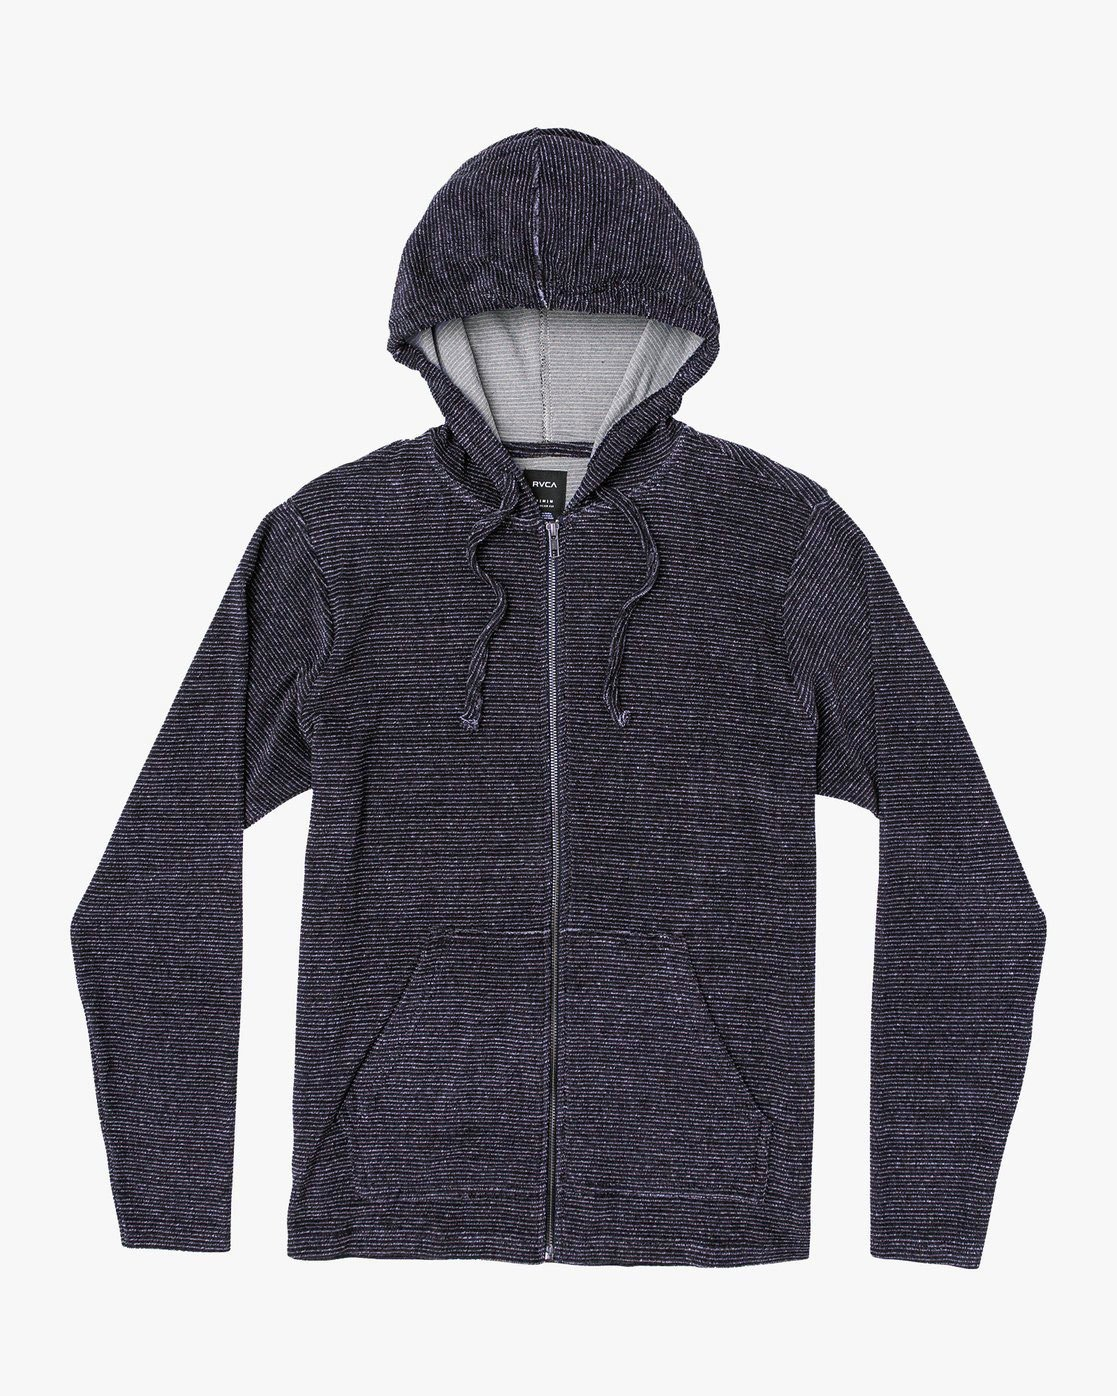 0 Super Marle Zip Knit Hoodie Blue M951VRSM RVCA